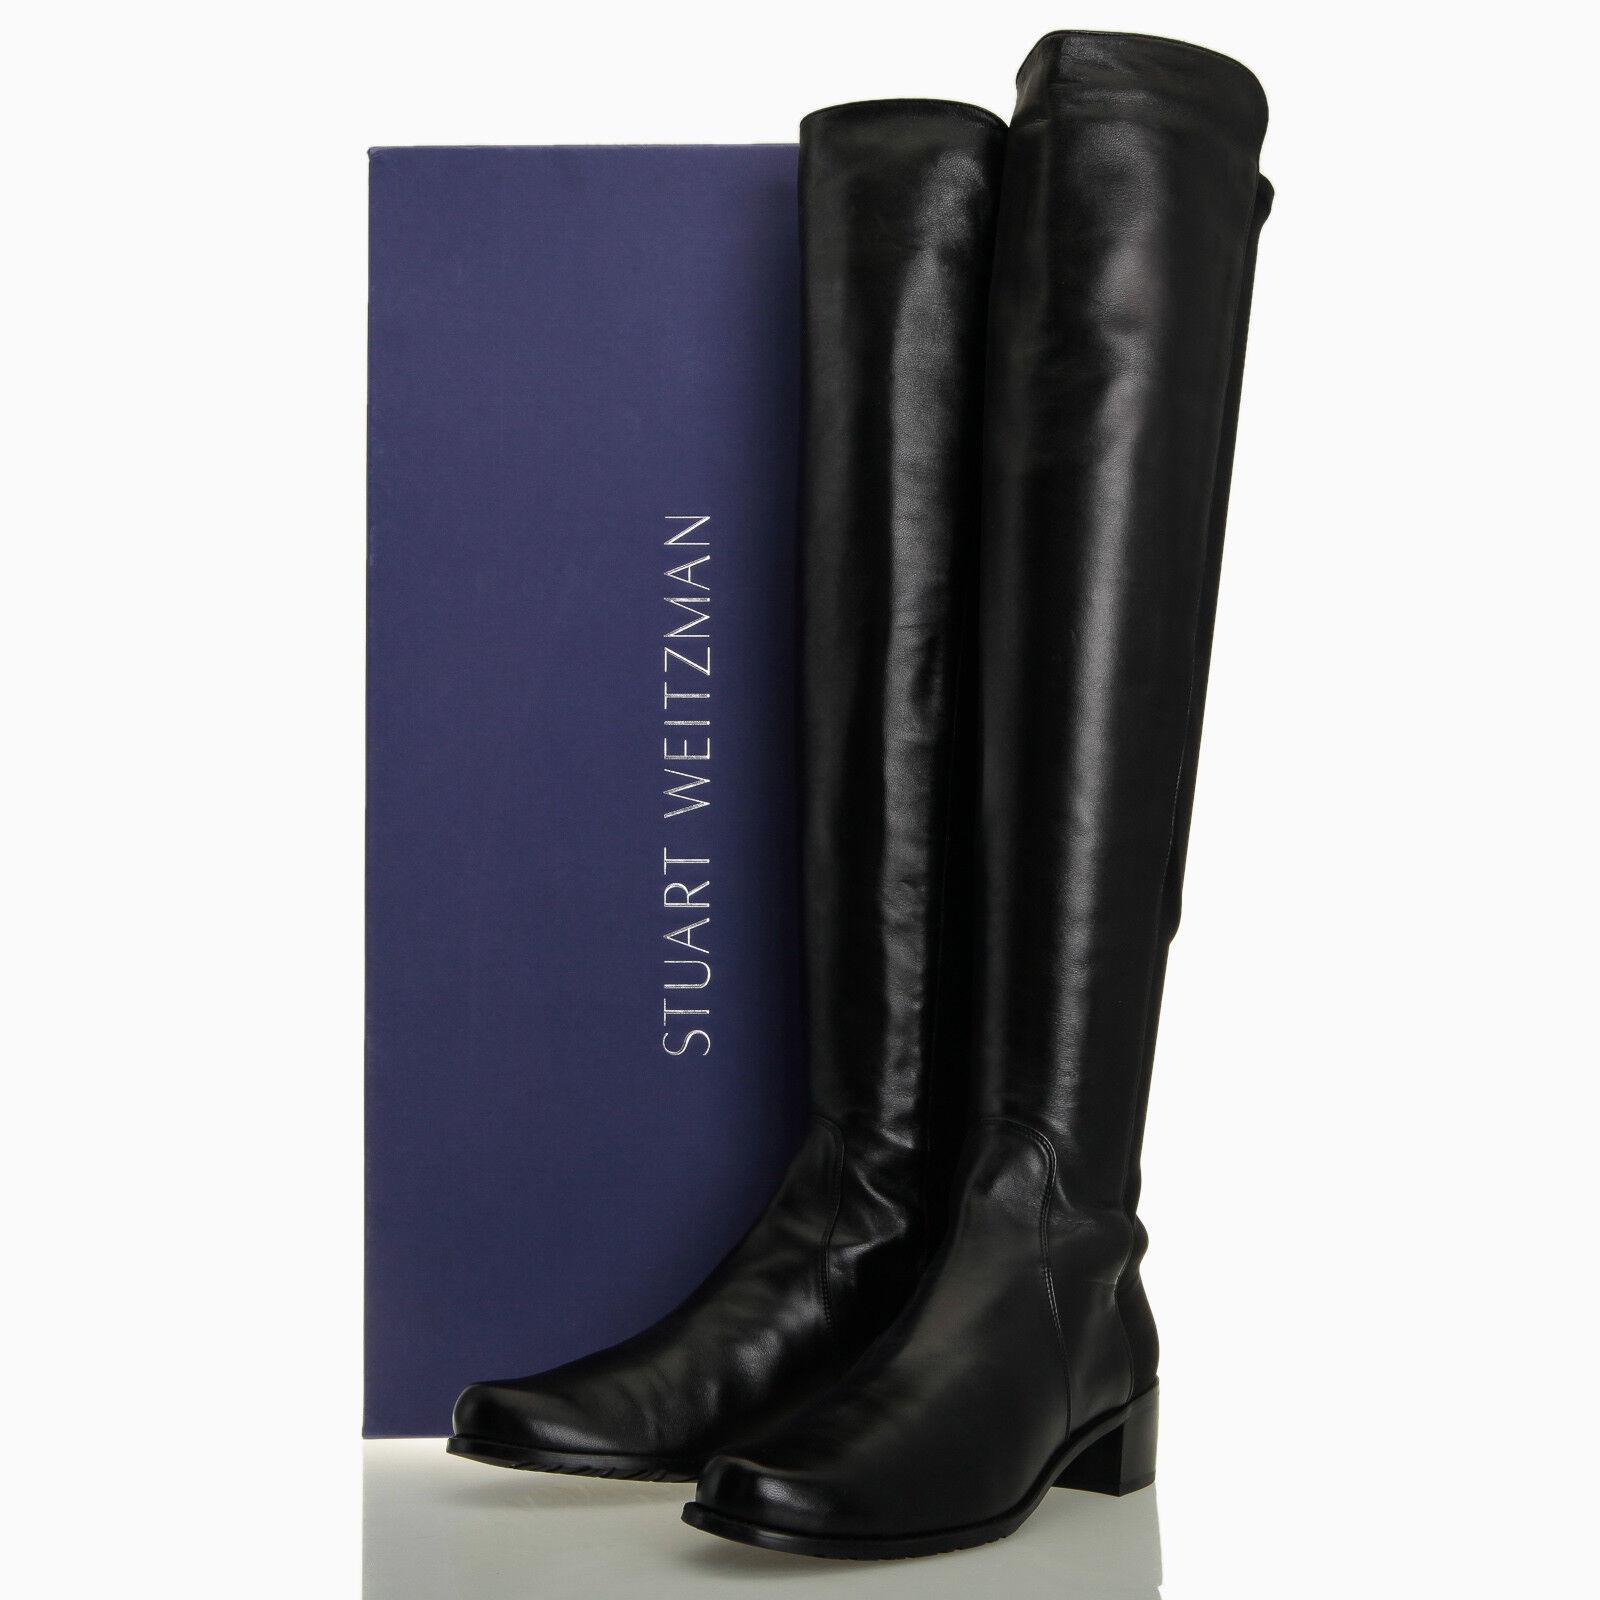 Stuart Weitzman Reserve Negro Napa encima de la rodilla botas-Para botas-Para botas-Para Mujer 10.5 M  el estilo clásico